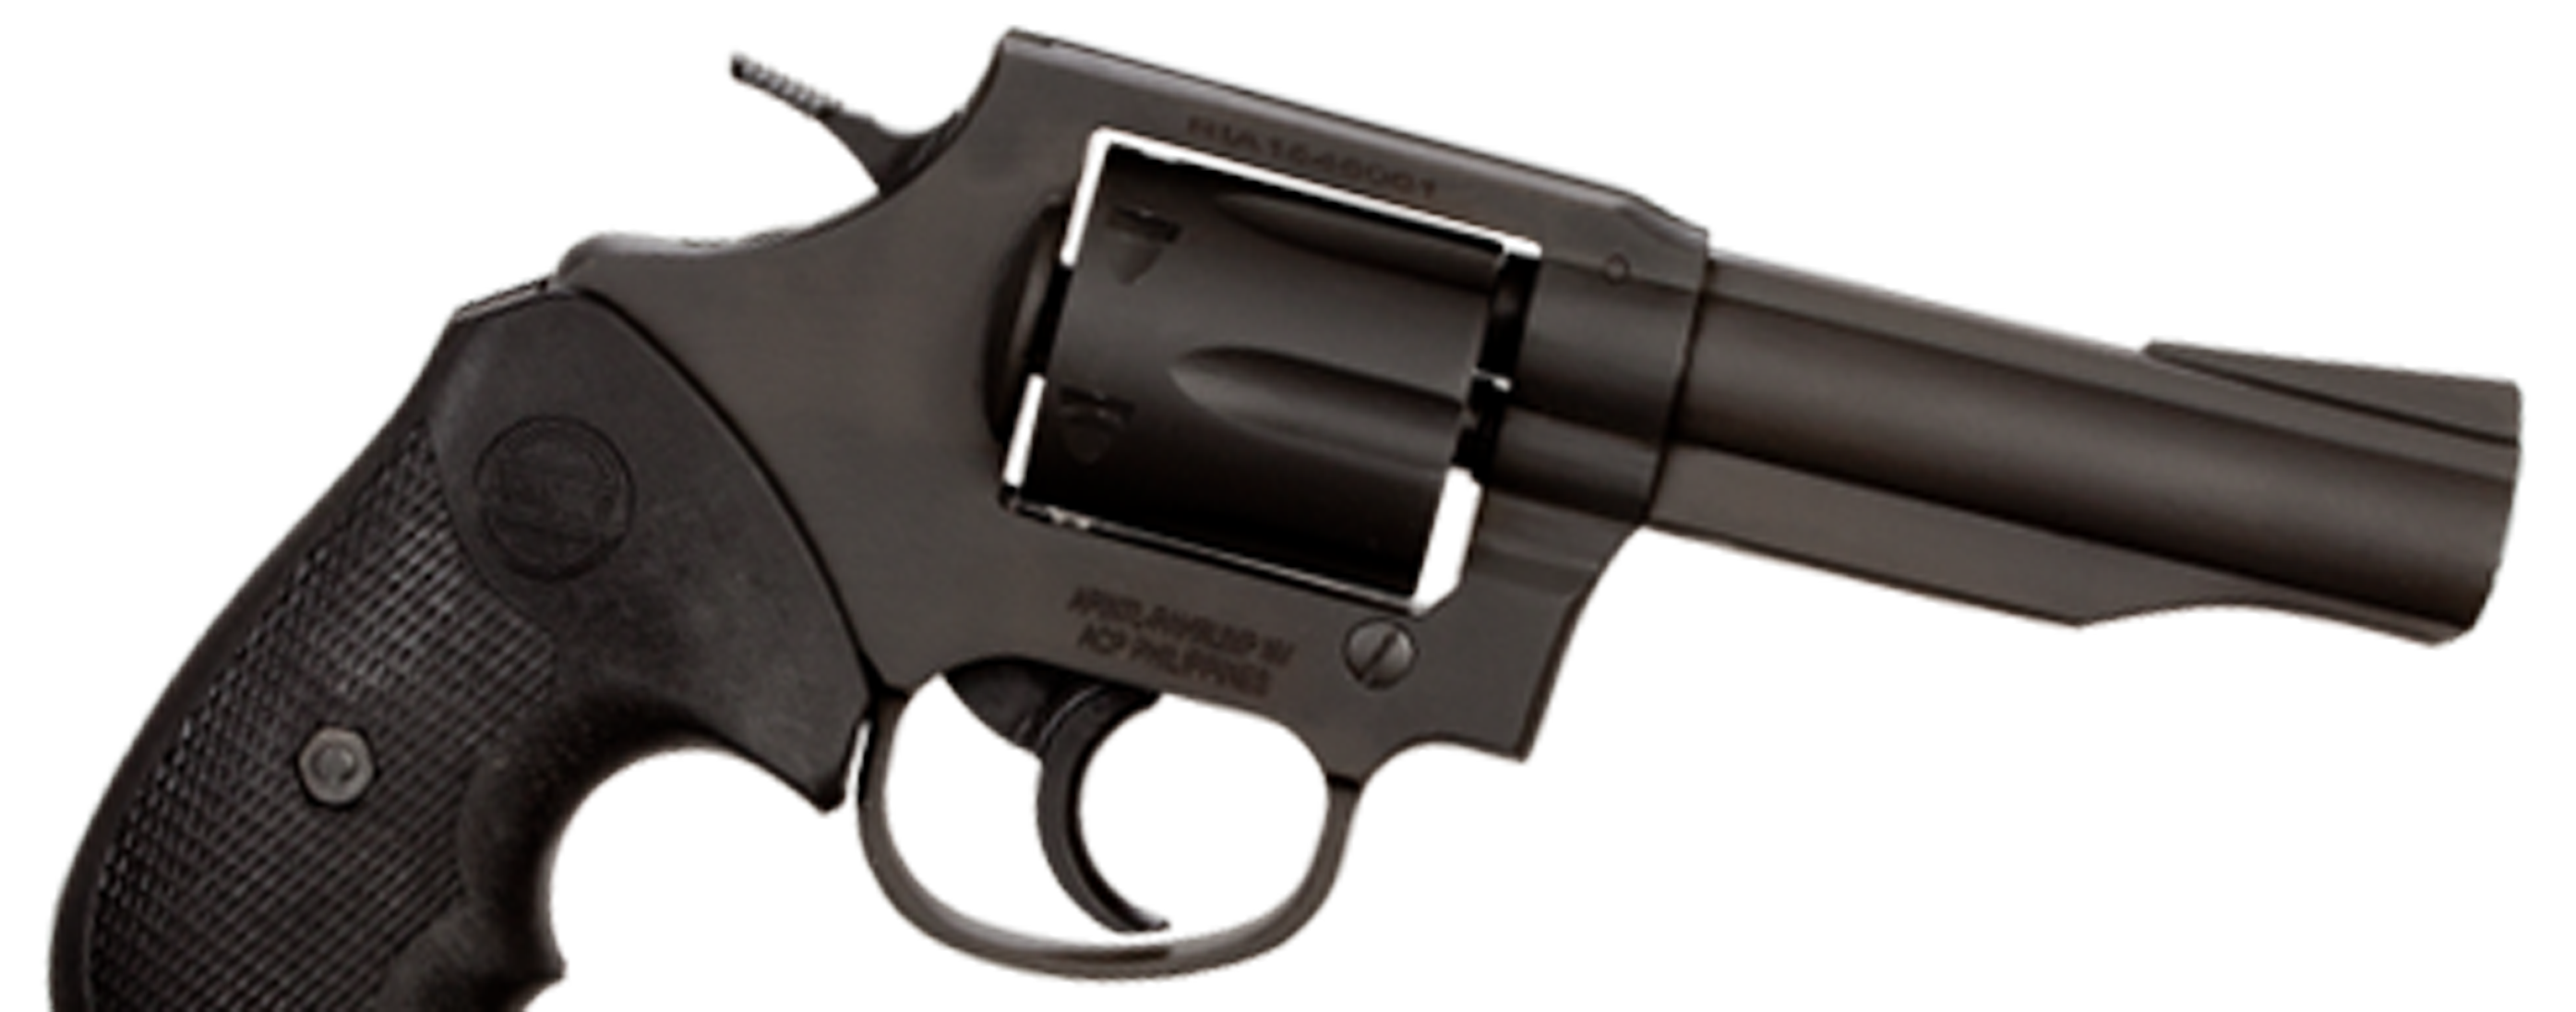 51261_Revolver_M200_38spl_right_copy.png